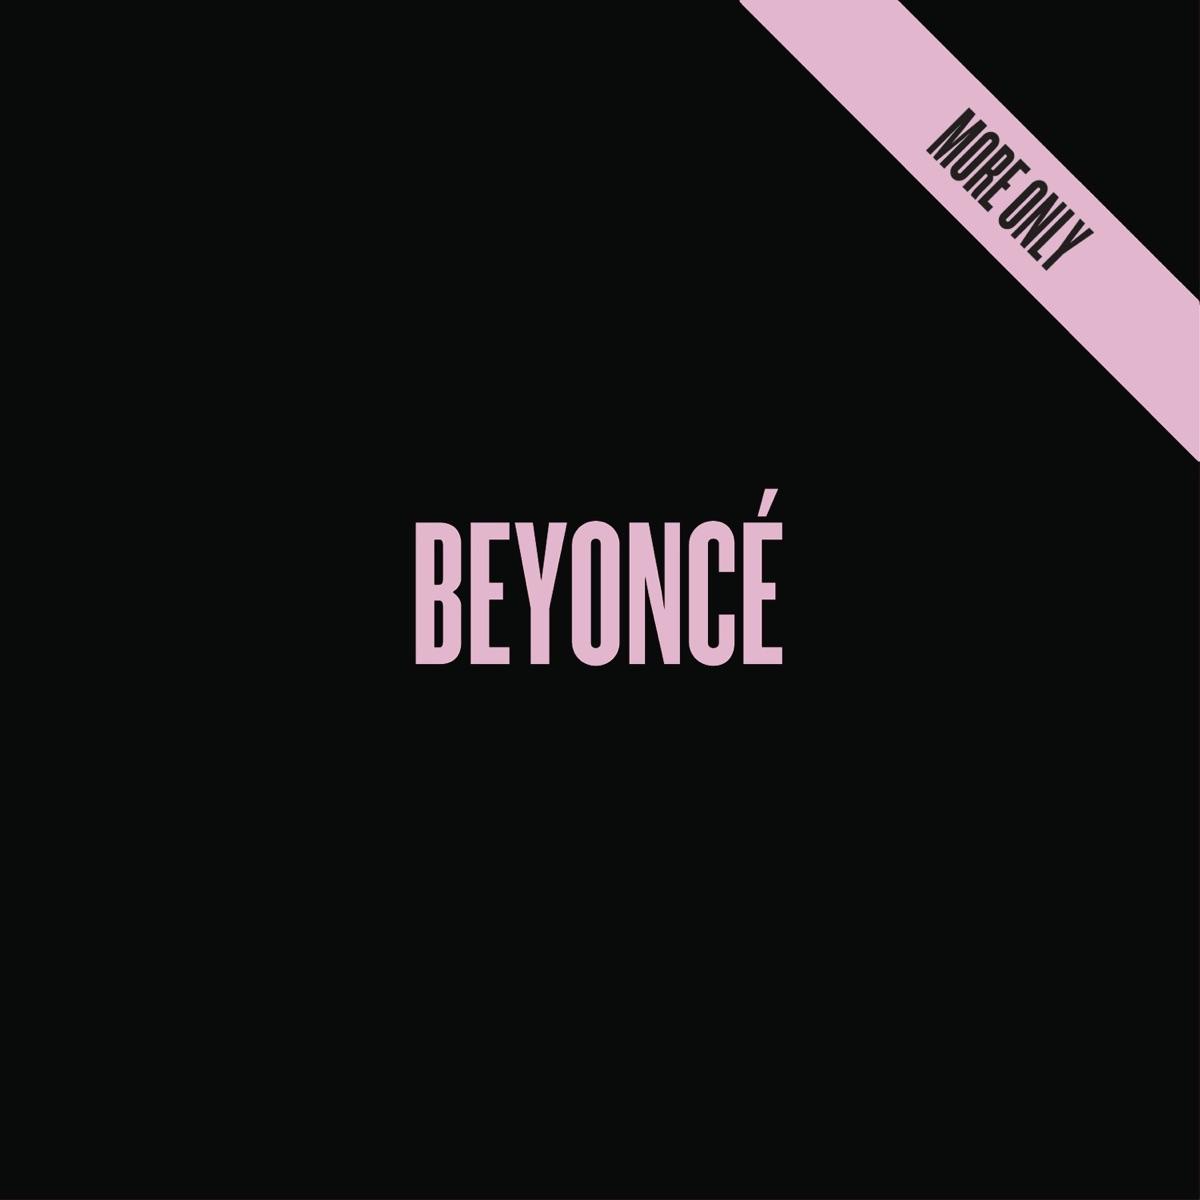 BEYONCÉ More Only - EP Beyoncé CD cover